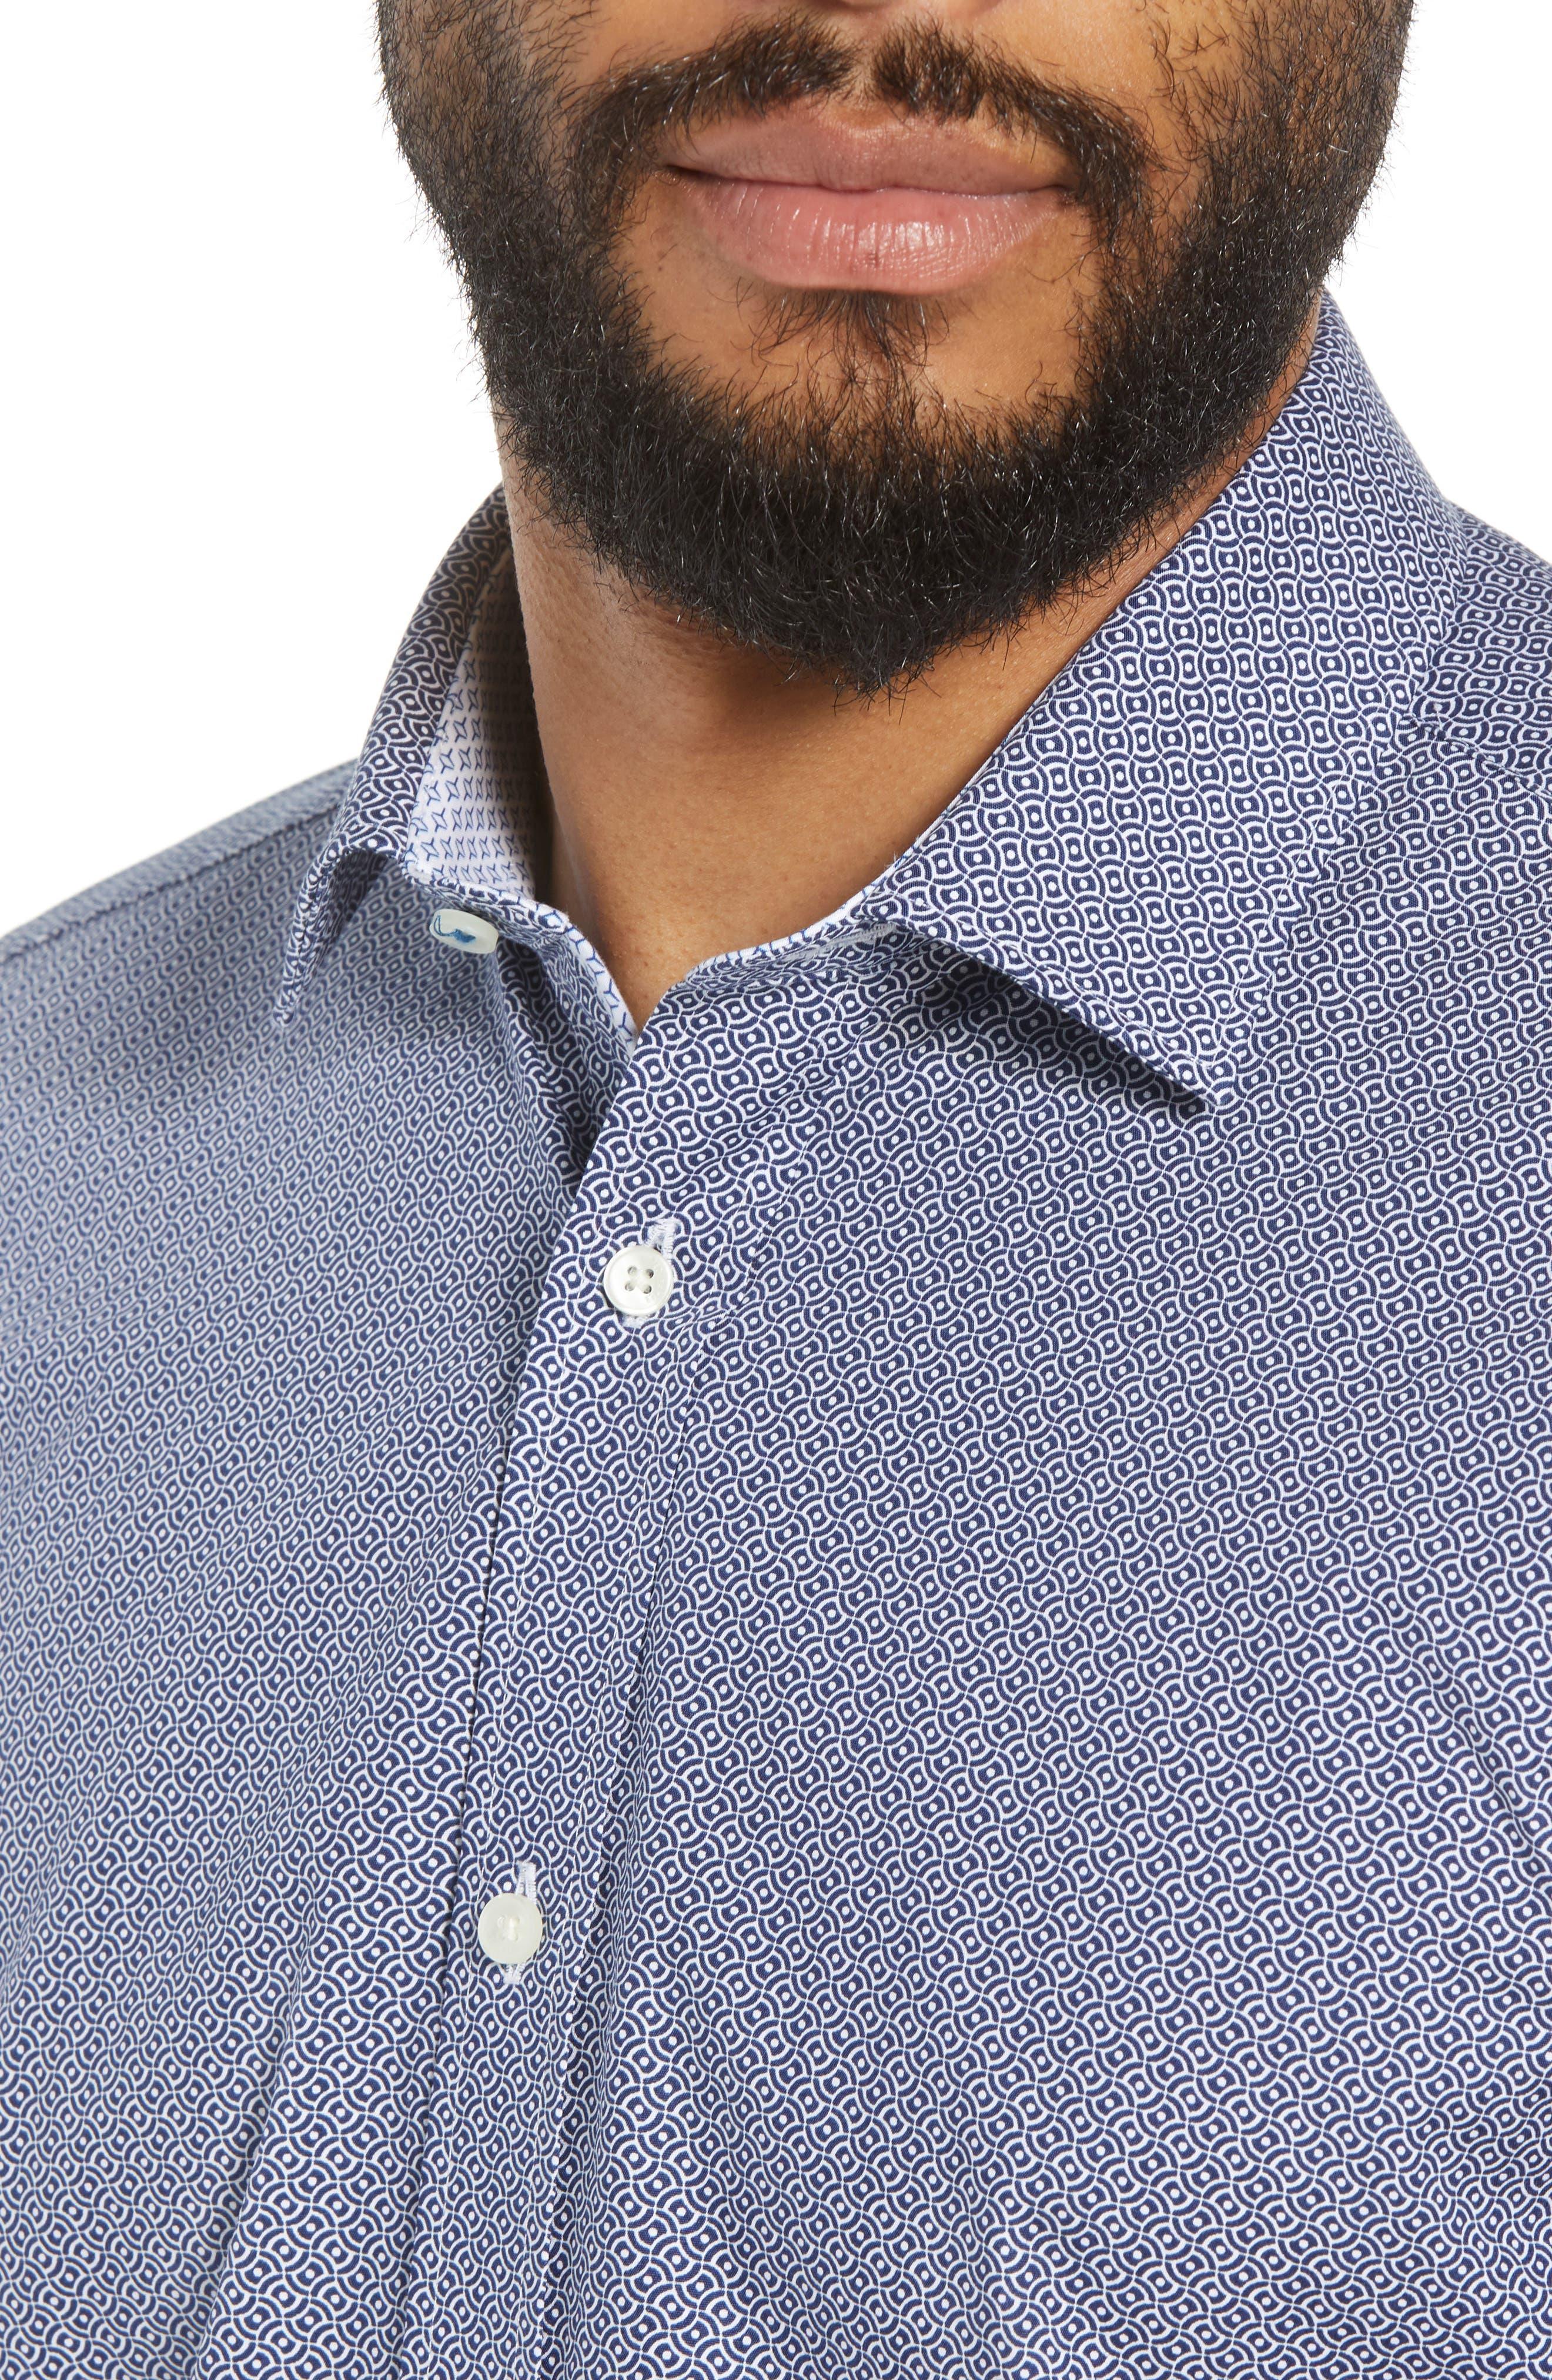 Footz Slim Fit Geometric Dress Shirt,                             Alternate thumbnail 2, color,                             NAVY